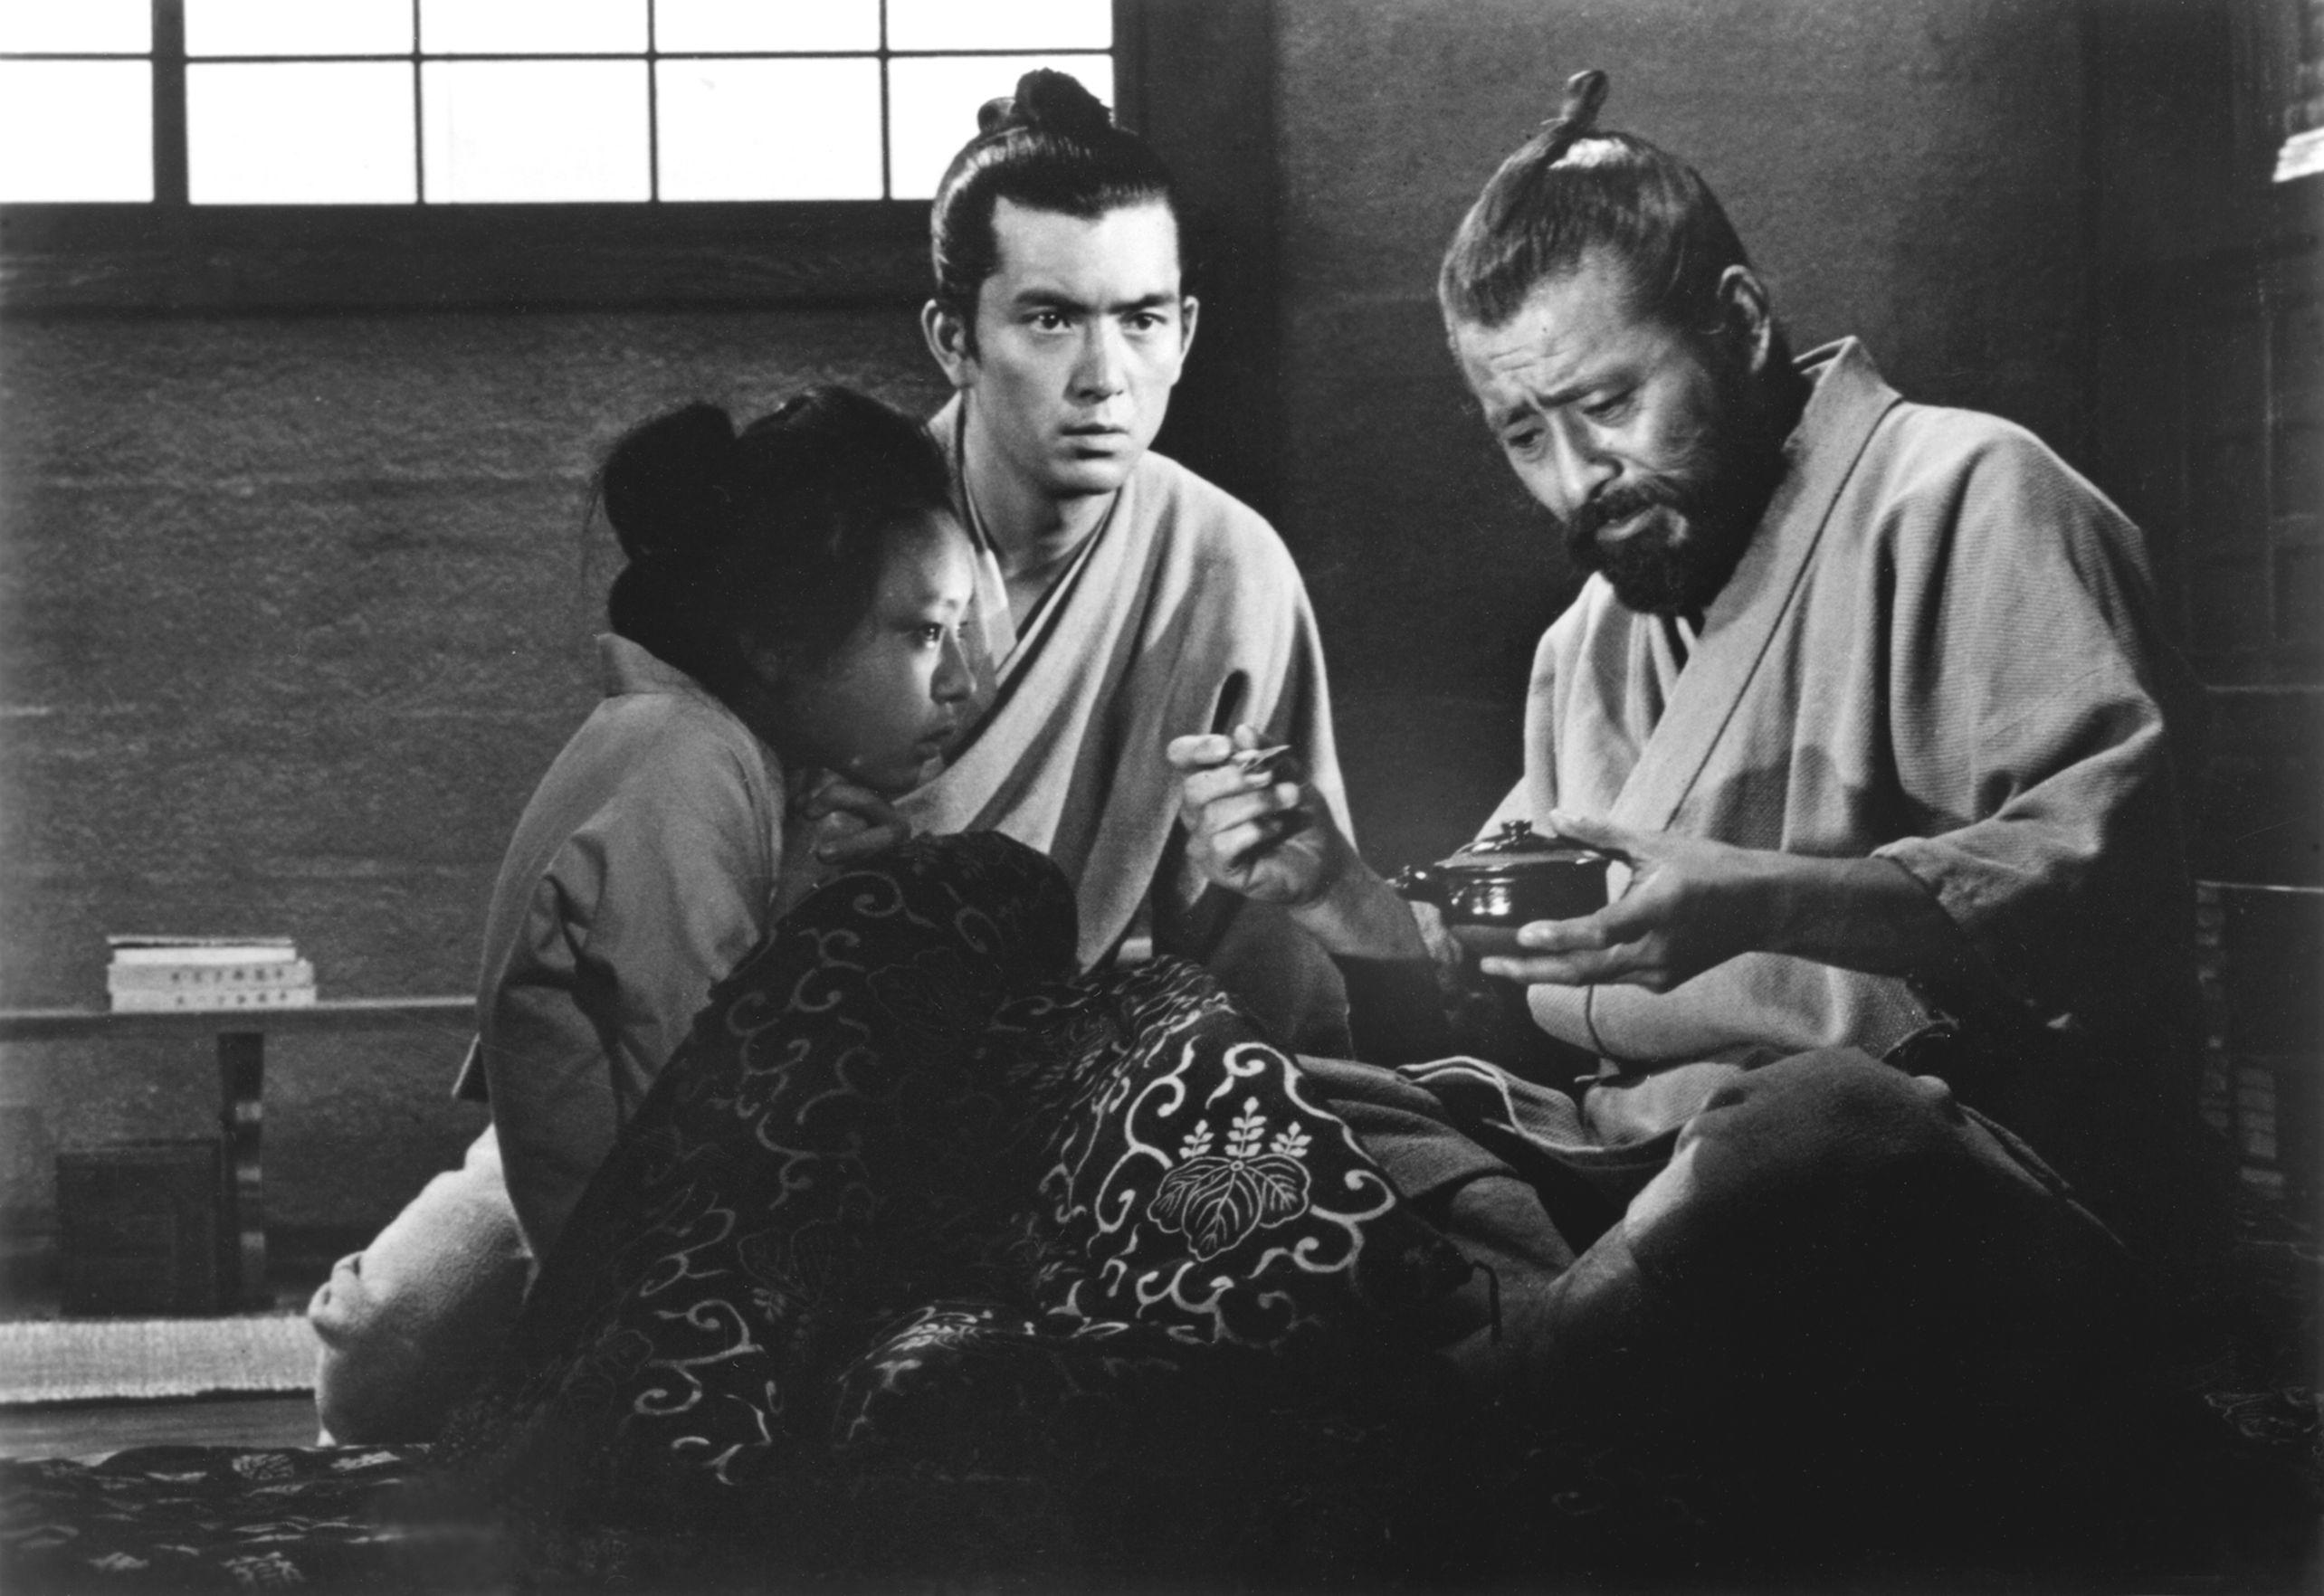 Toshirô Mifune, Yûzô Kayama, and Miyoko Nakamura in Akahige (1965)